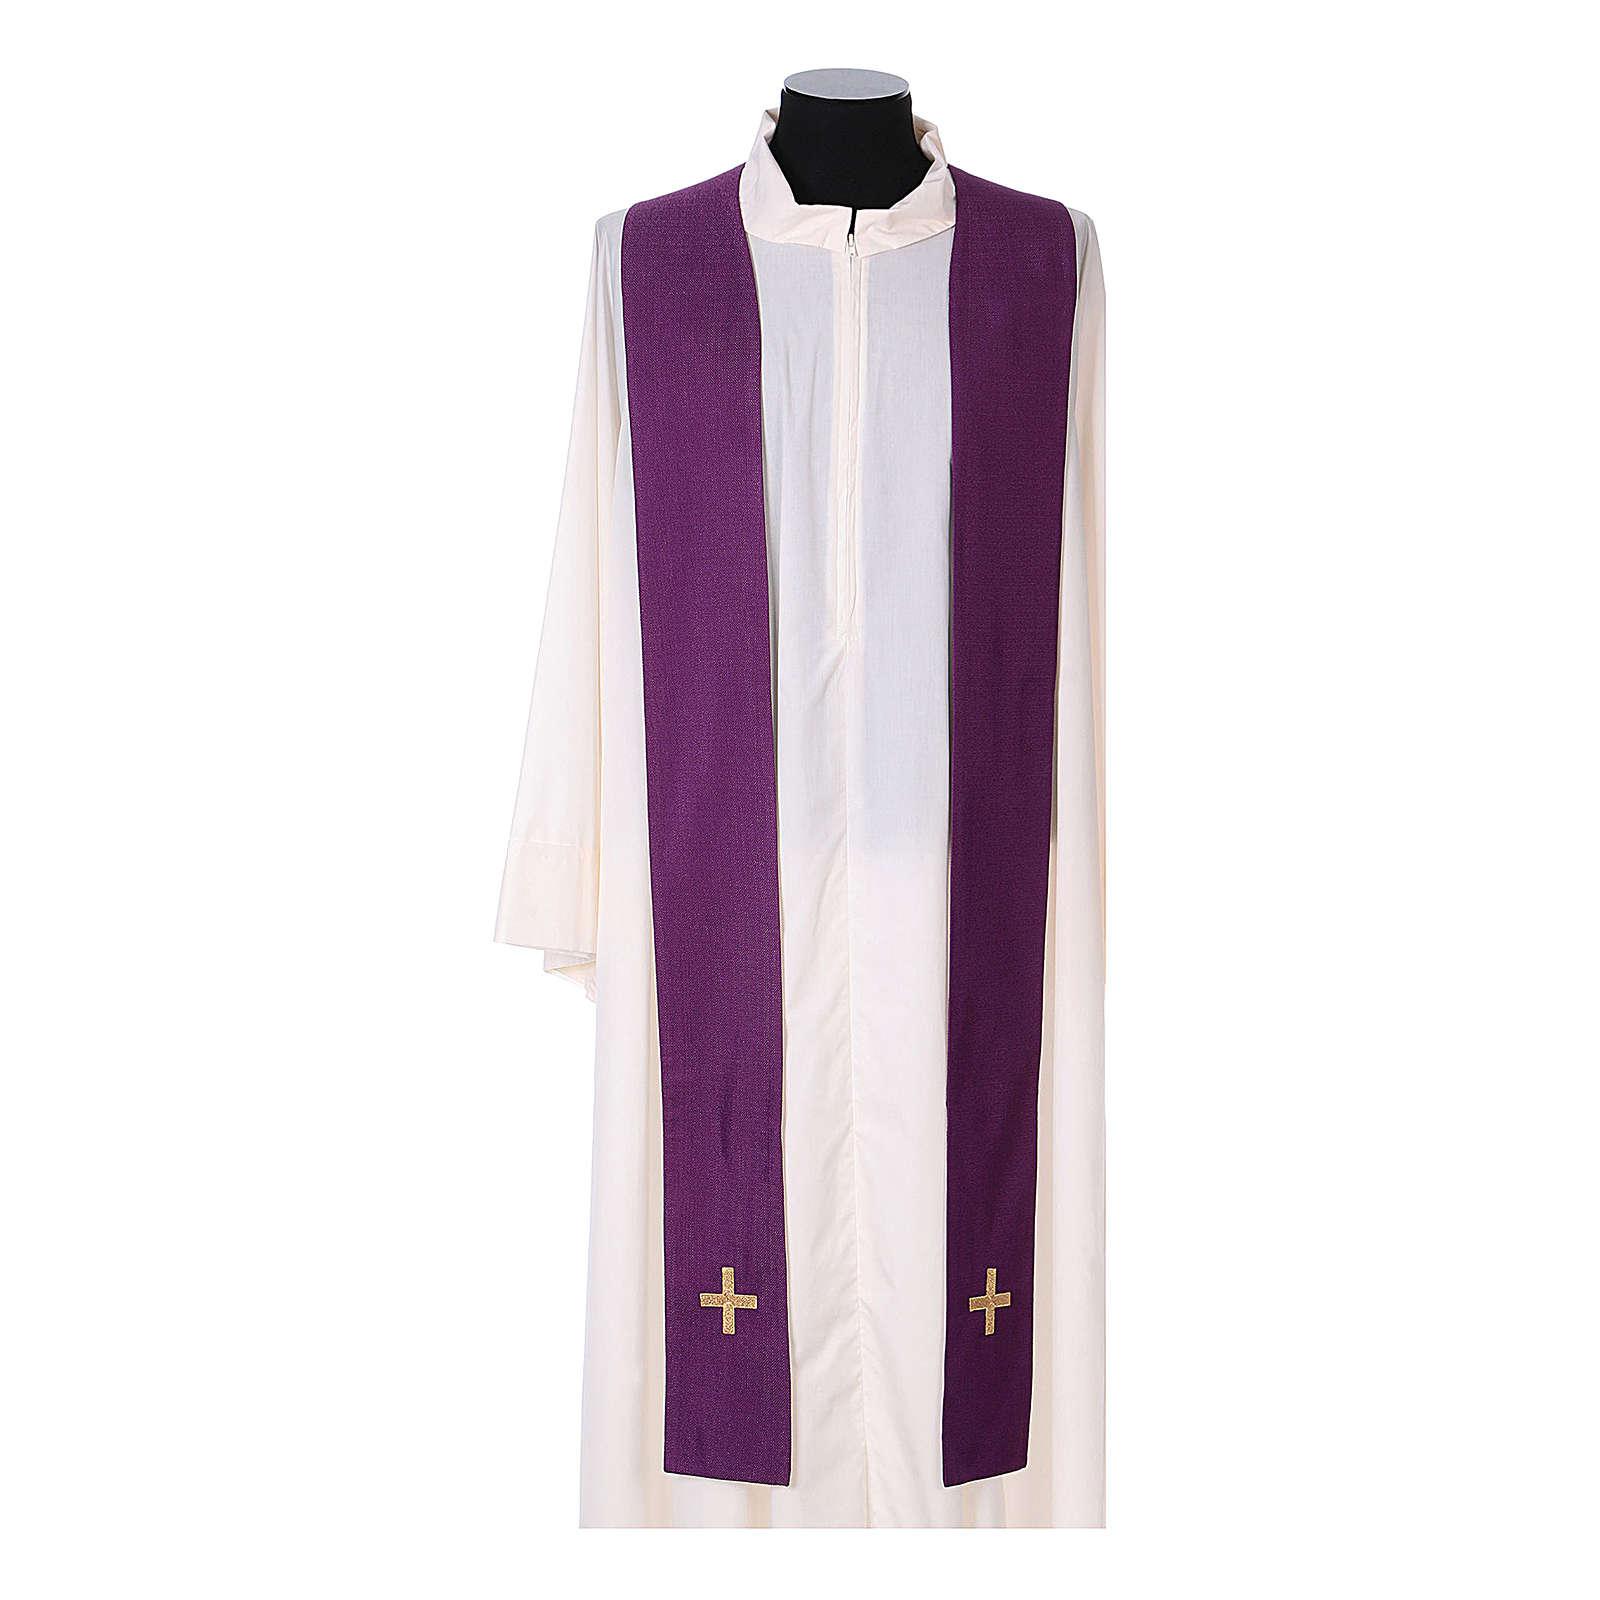 Chasuble and stole, Italian neckline 4